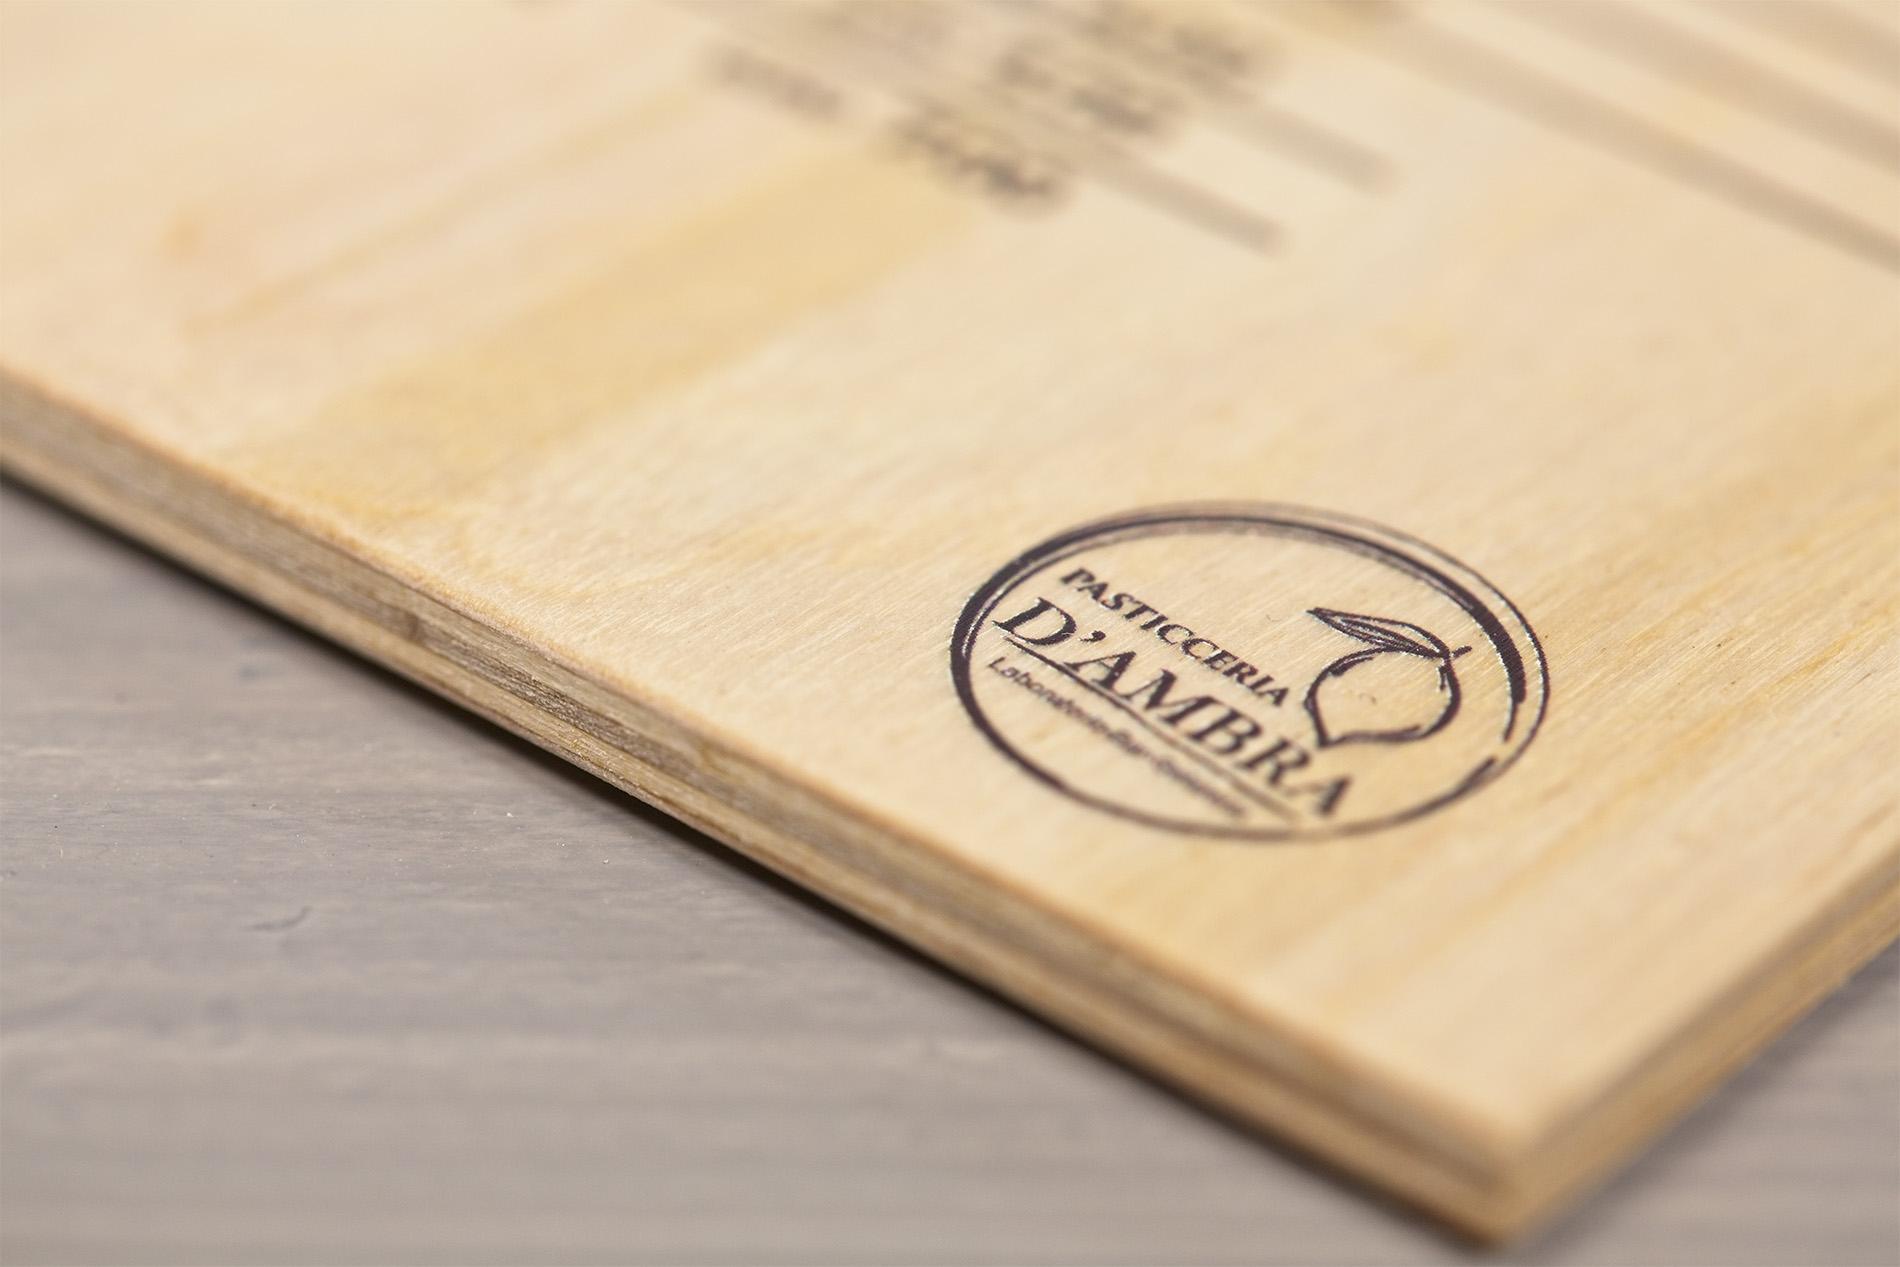 Portamenu Con Pinza Clipboard Excelsior Deluxe